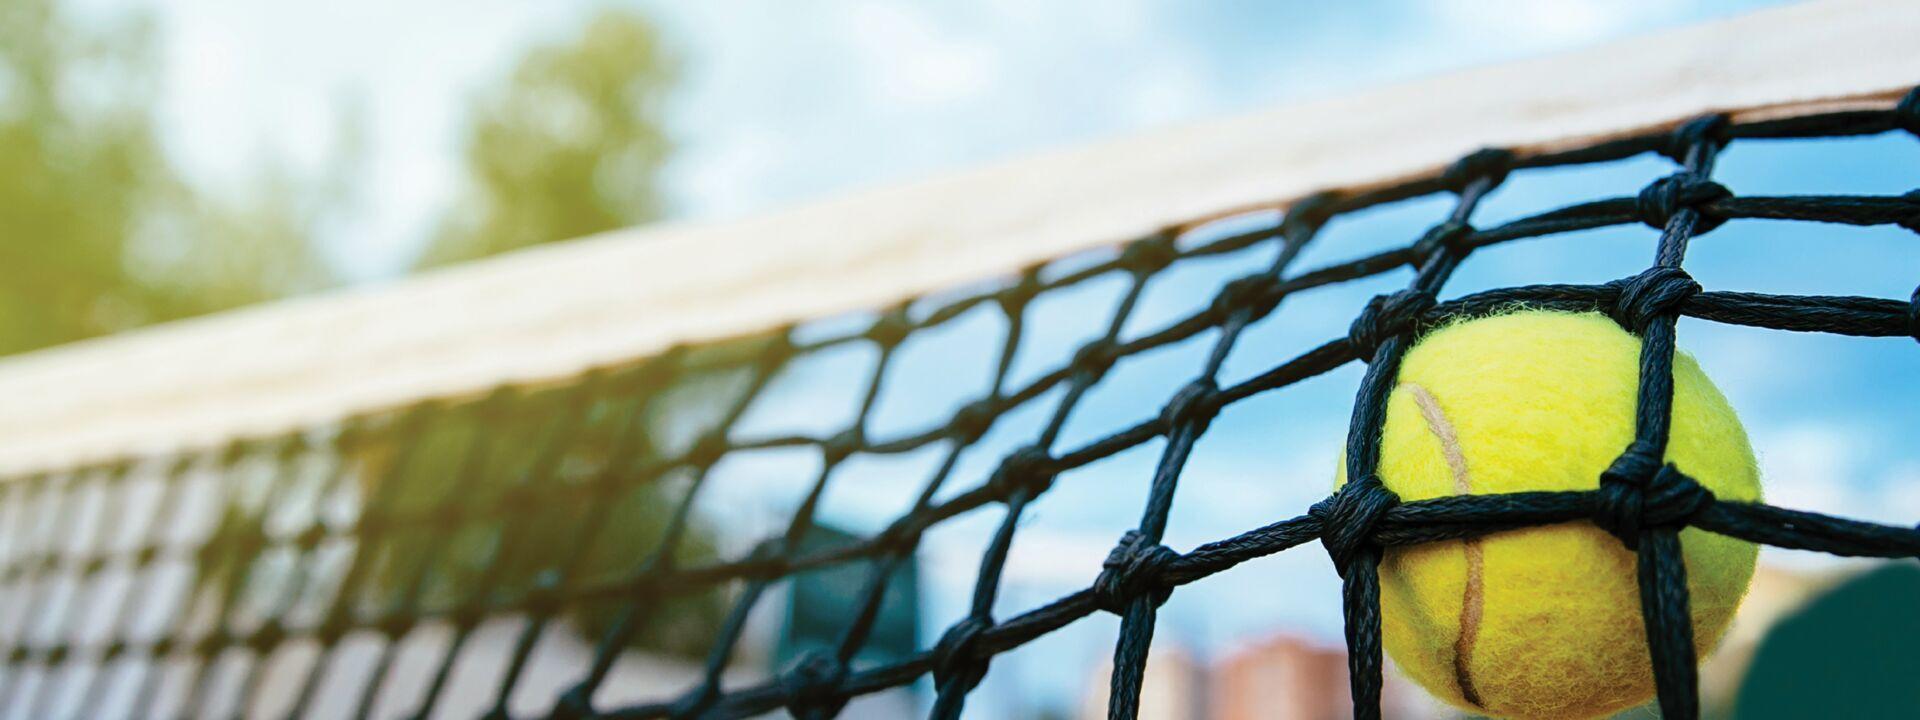 The tennis ball hits the net